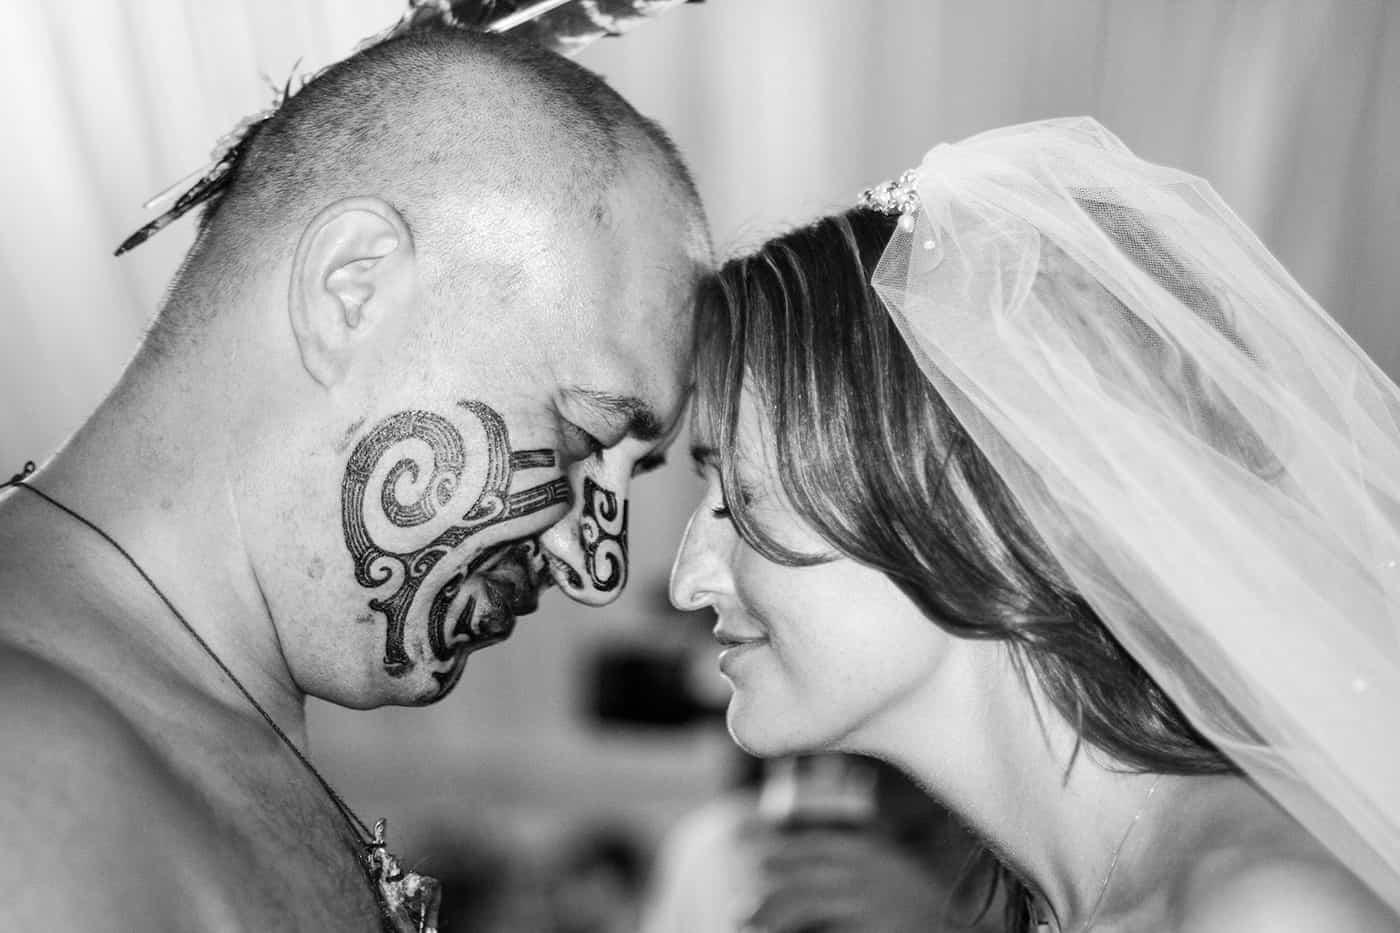 Haka in a wedding